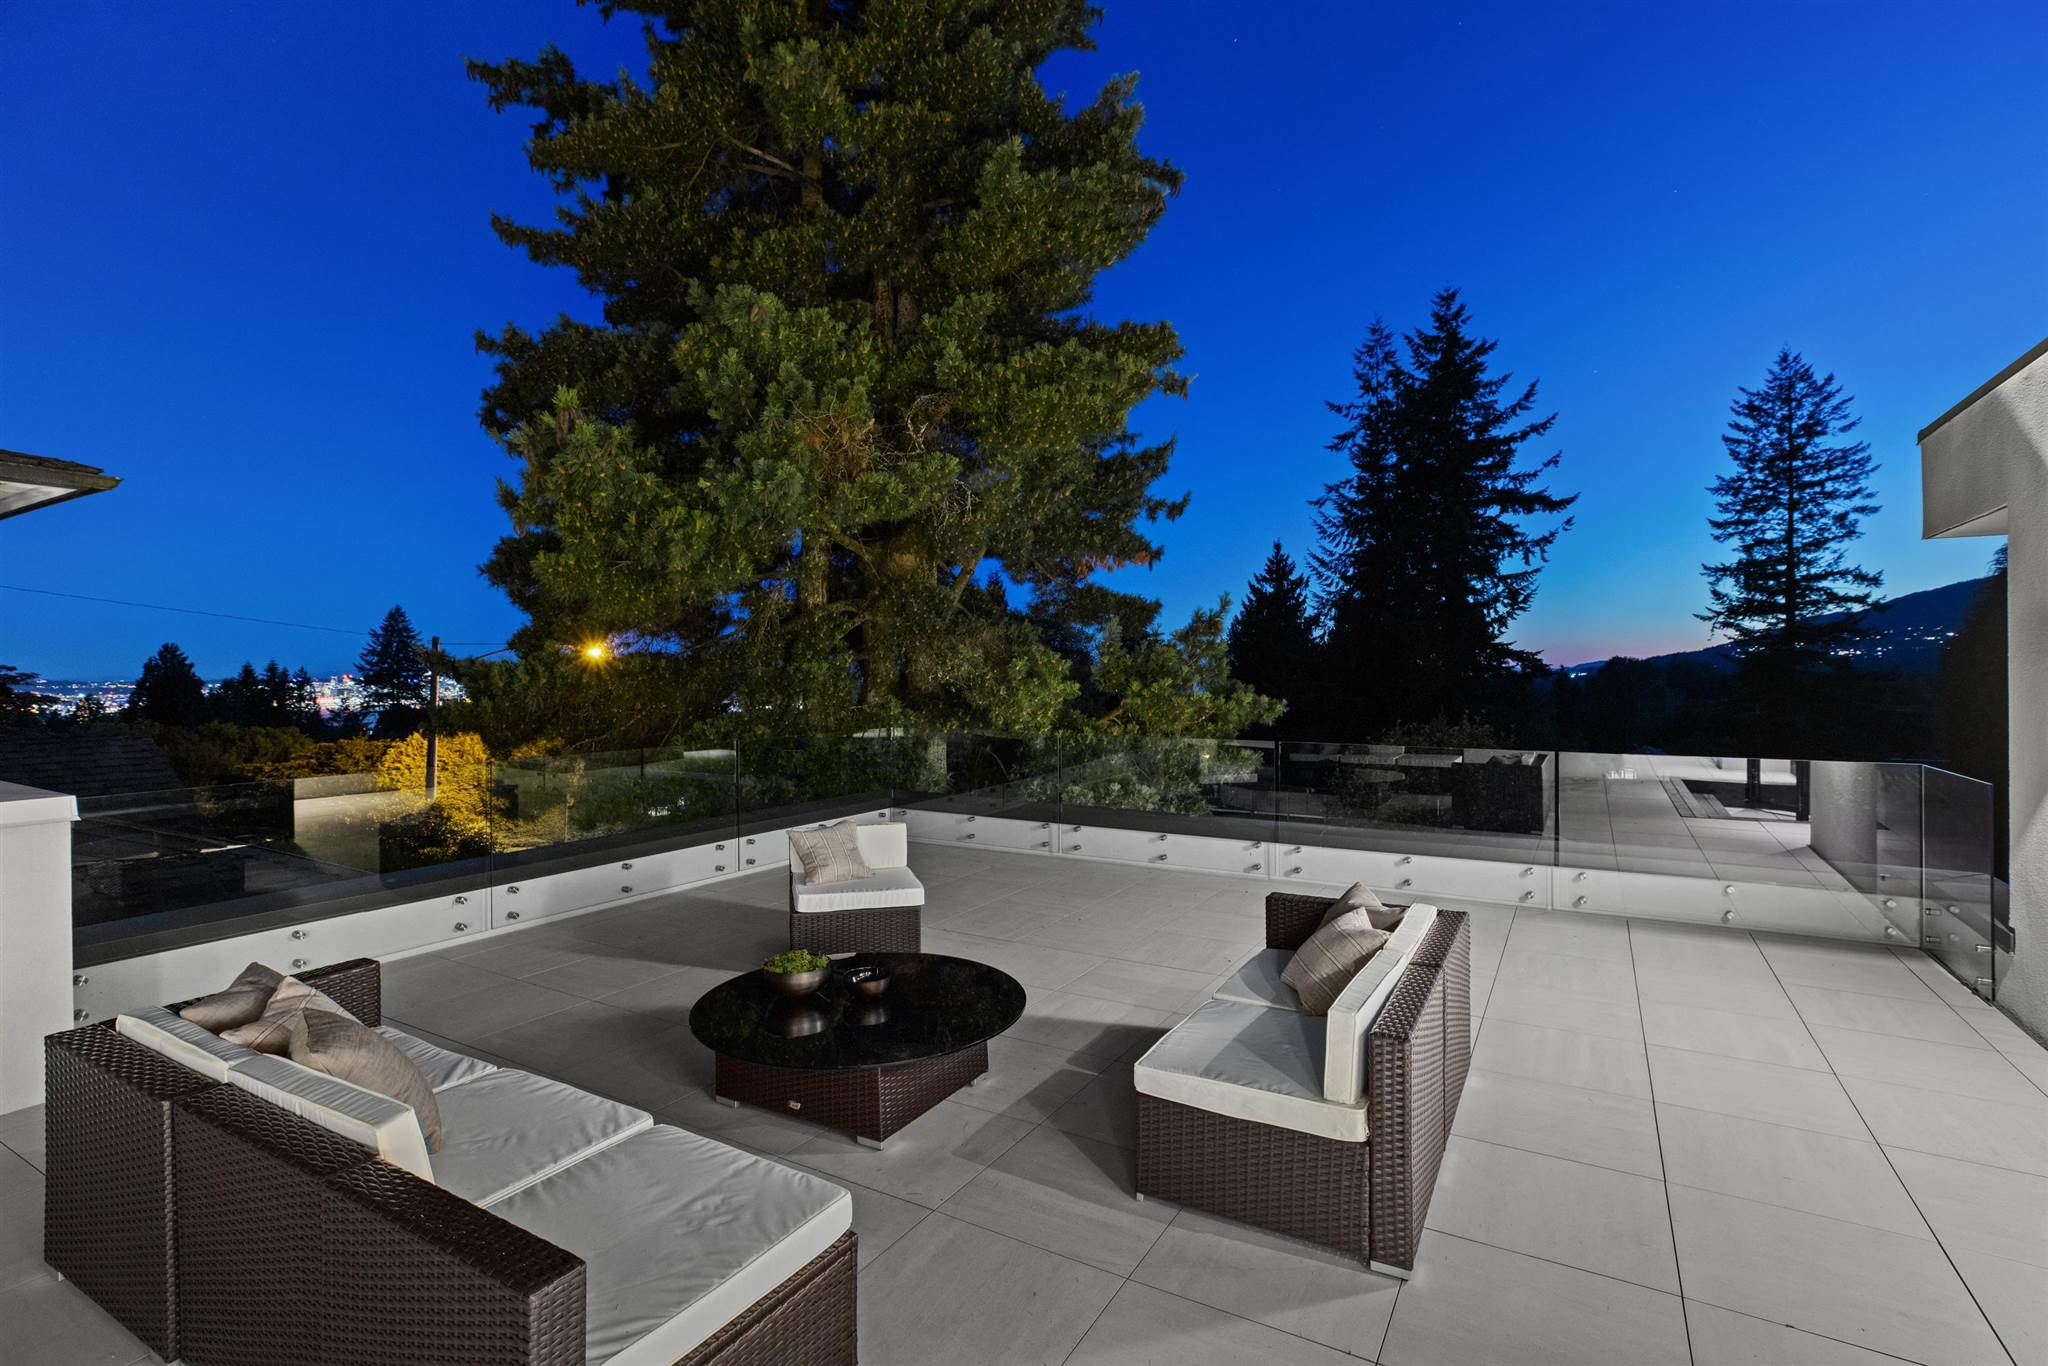 276 SANDRINGHAM CRESCENT - Upper Lonsdale House/Single Family for sale, 7 Bedrooms (R2617703) - #33